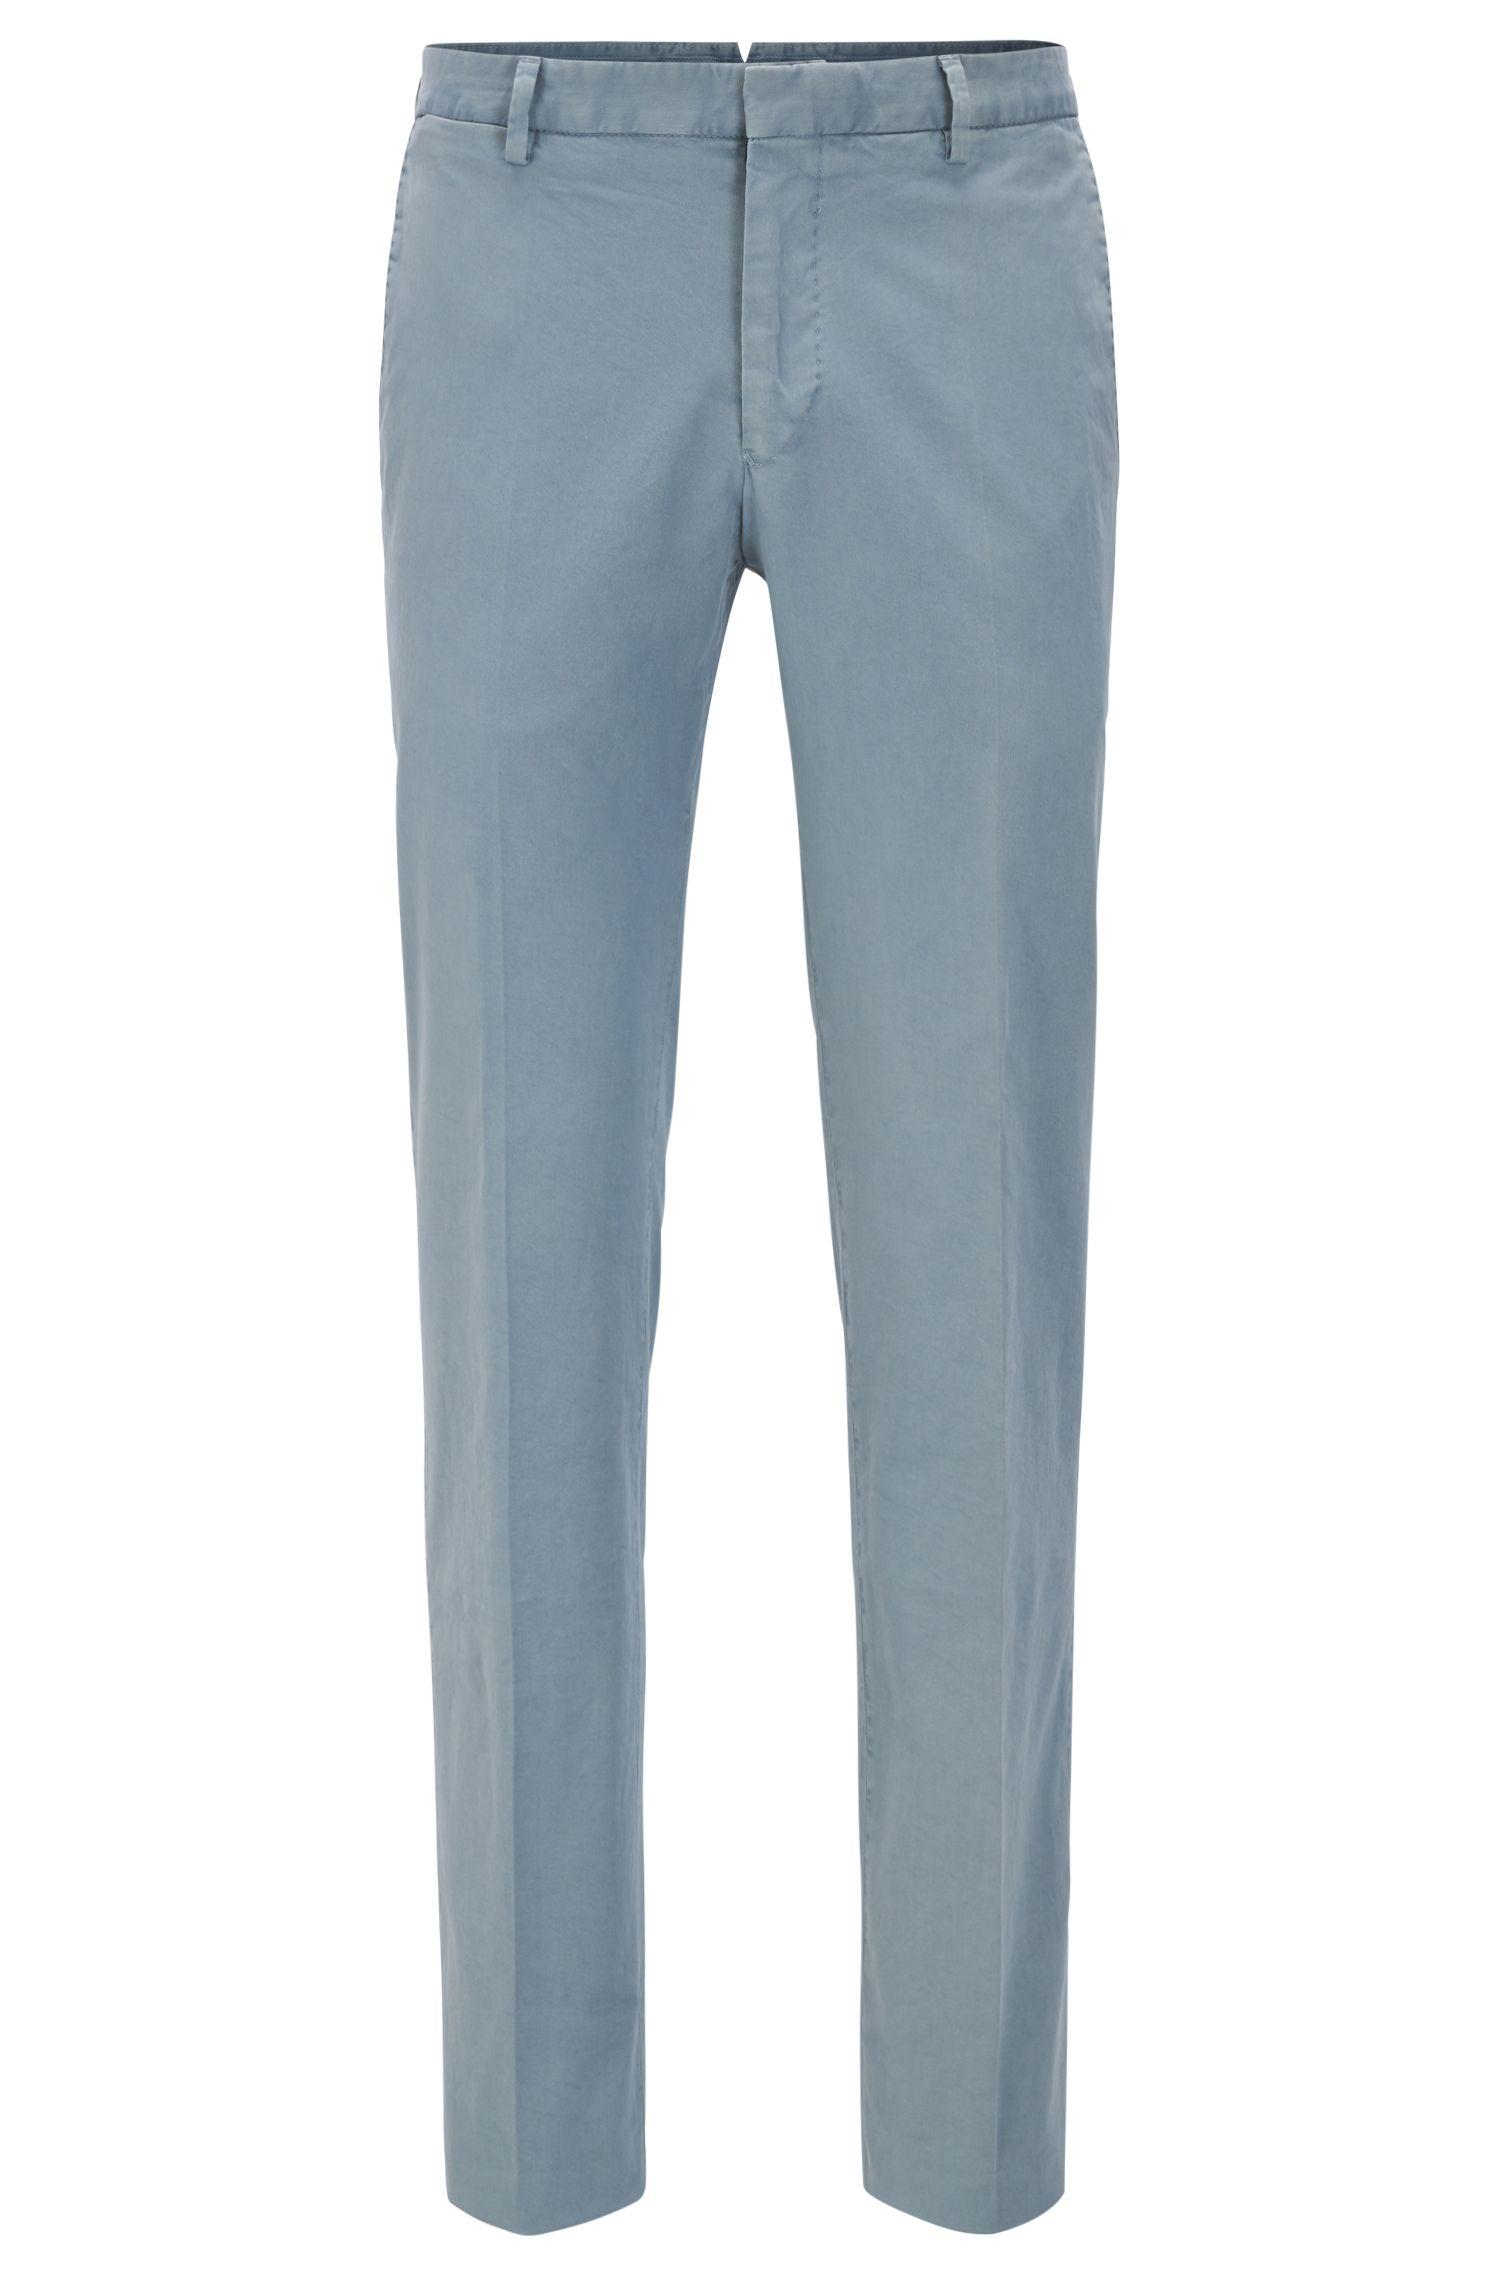 Pantalon Slim Fit en coton stretch teint en pièce